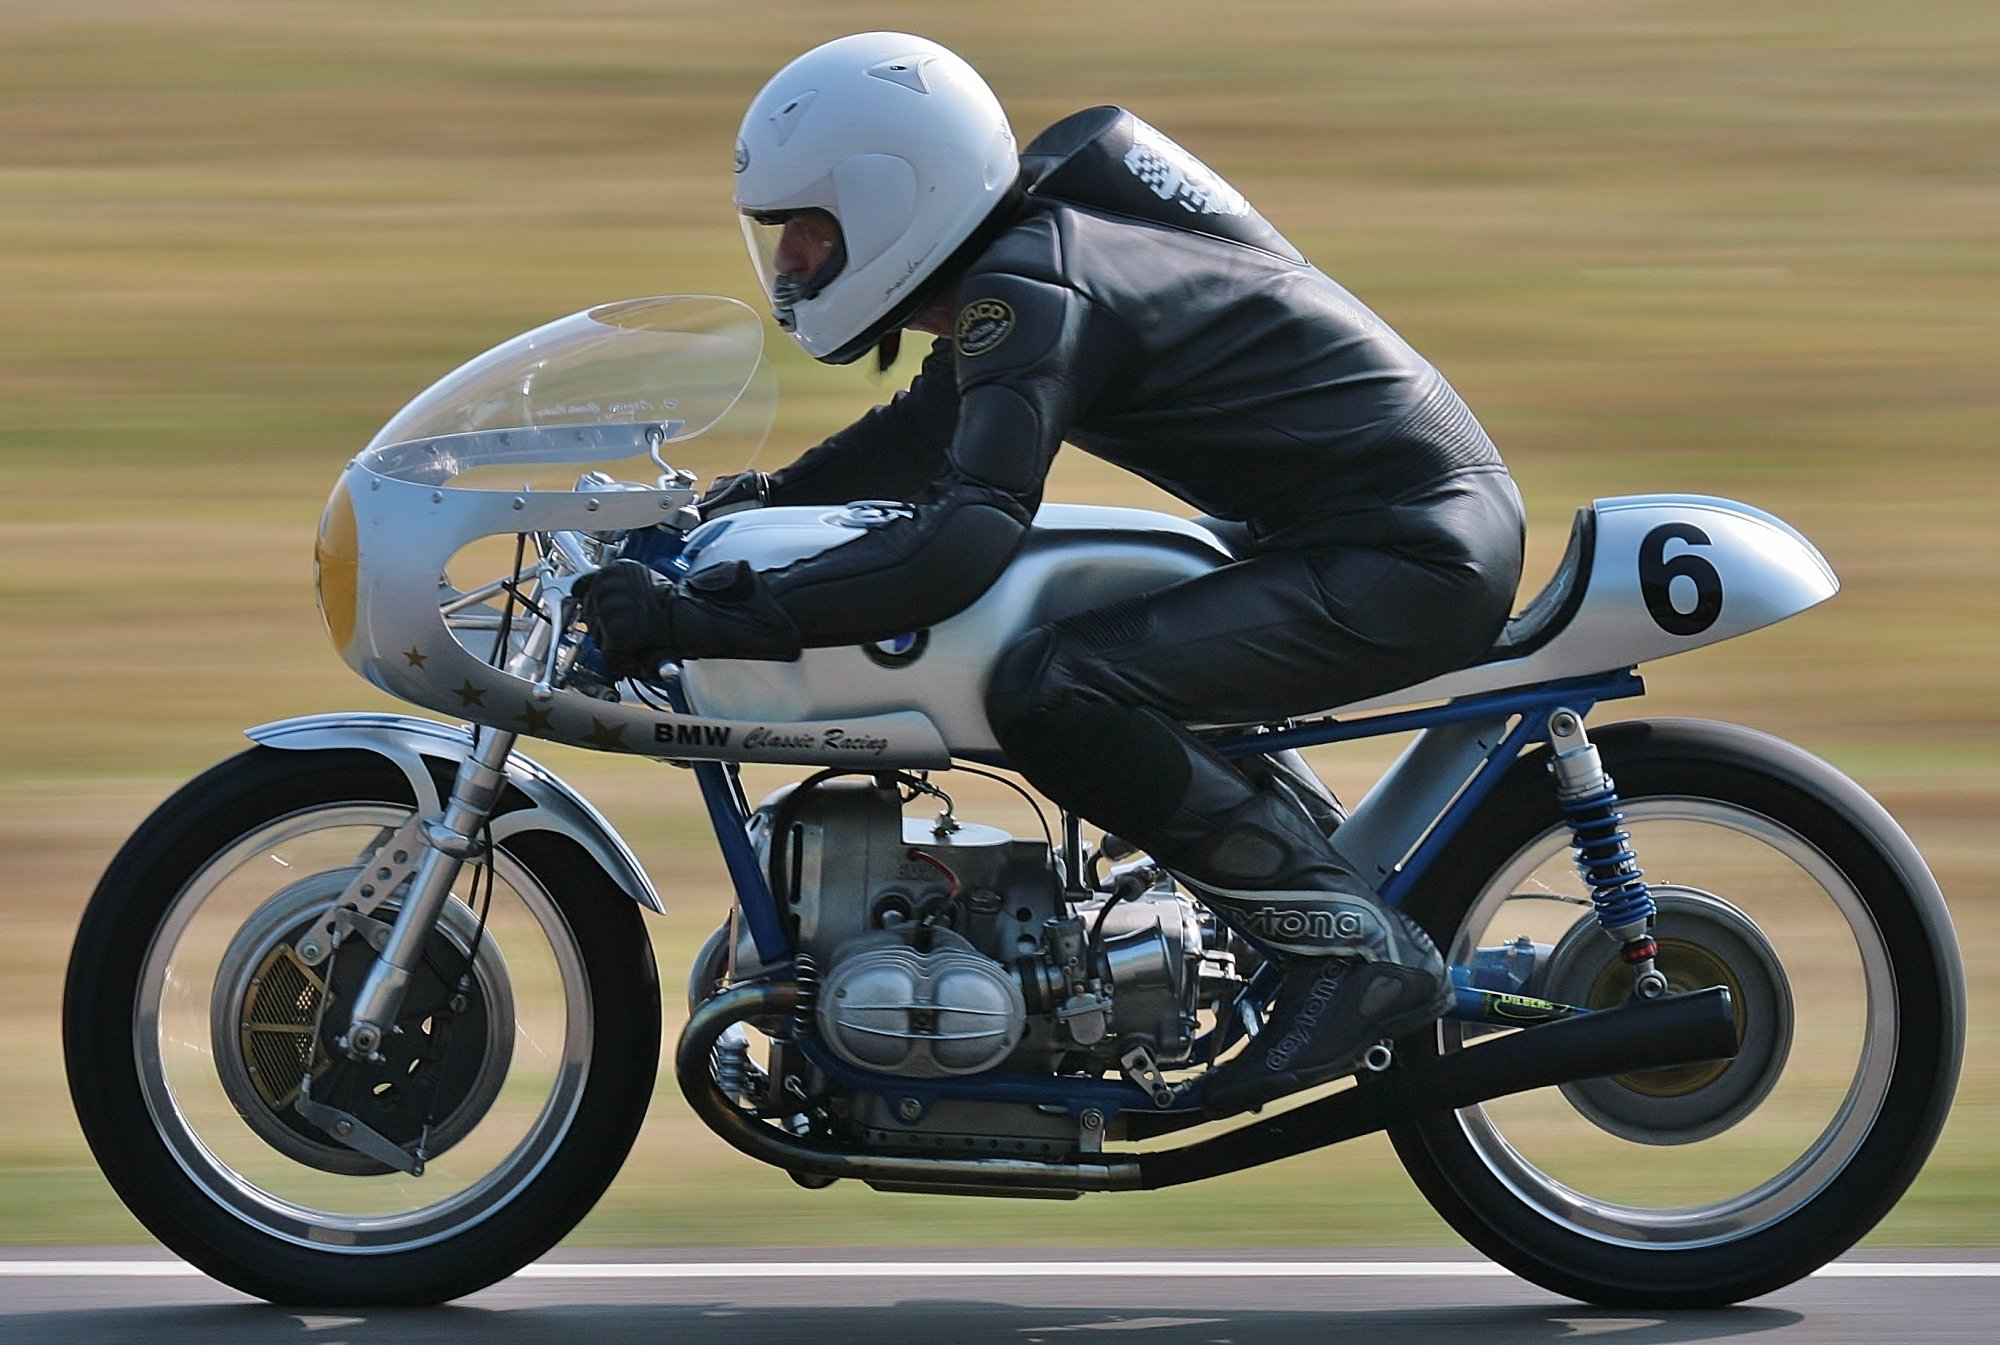 Classic_BMW_racing_motorcycle.jpg